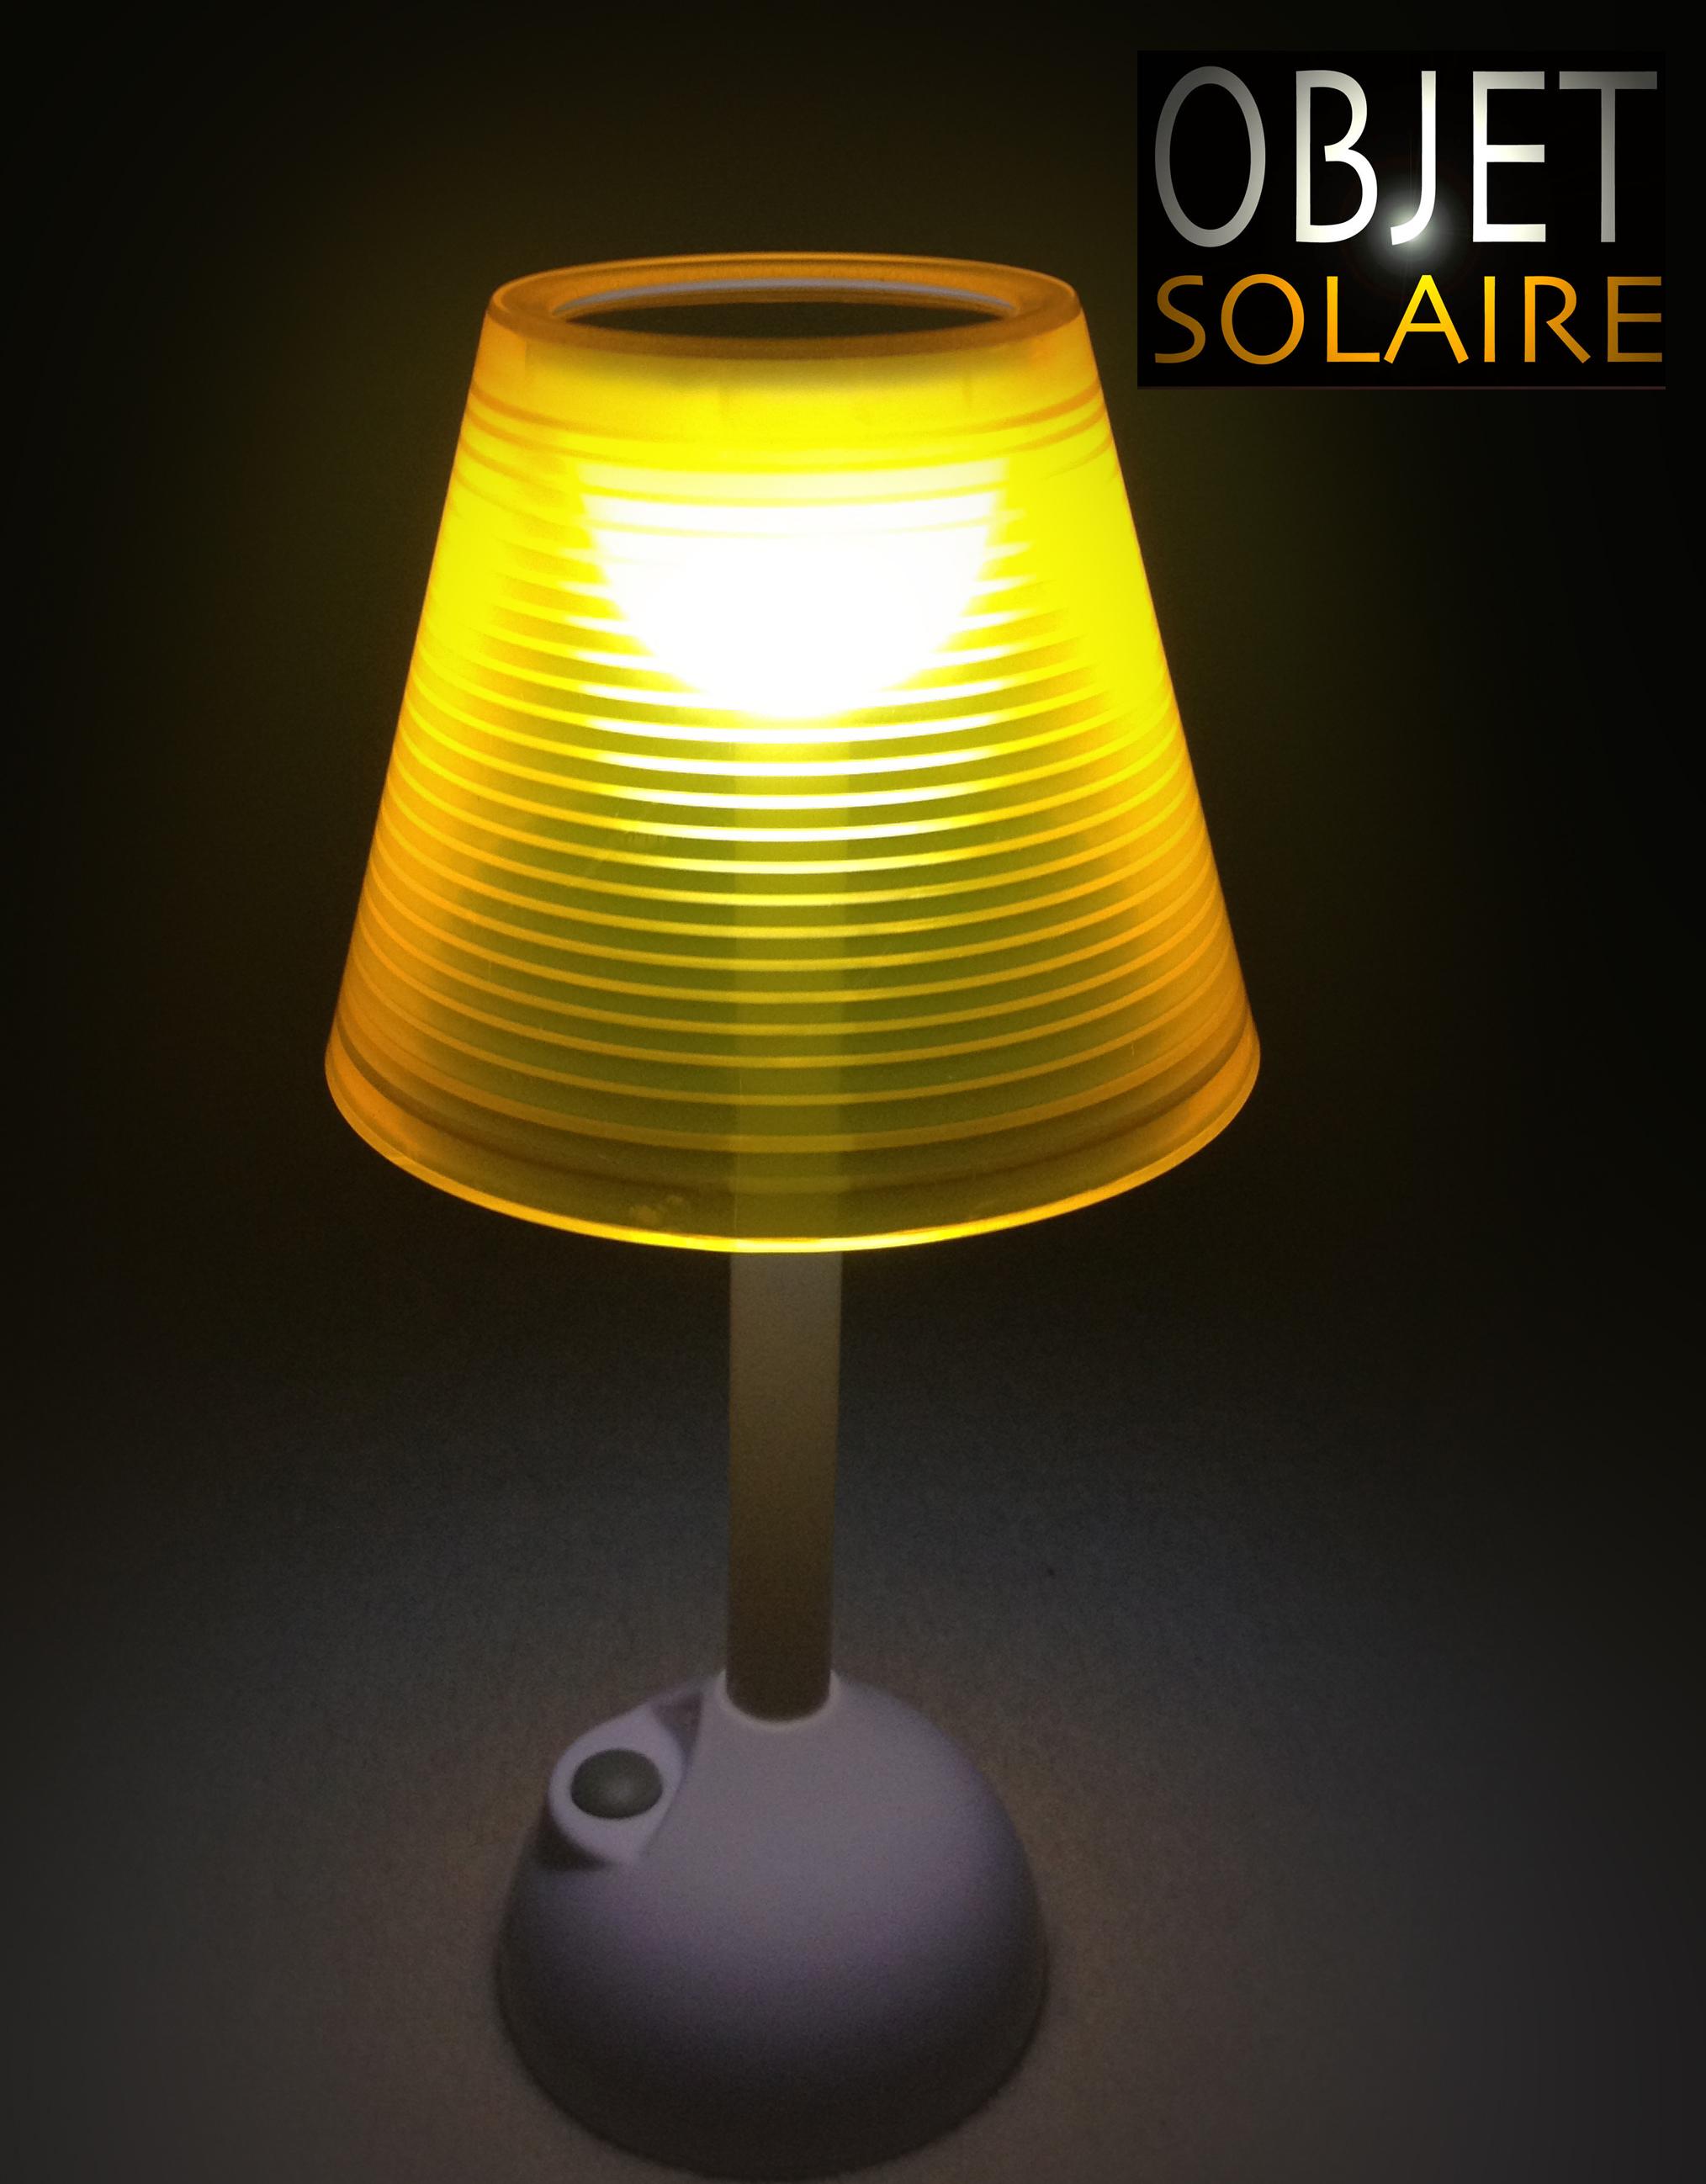 lampe solaire et usb lampes solaires decoratives table. Black Bedroom Furniture Sets. Home Design Ideas